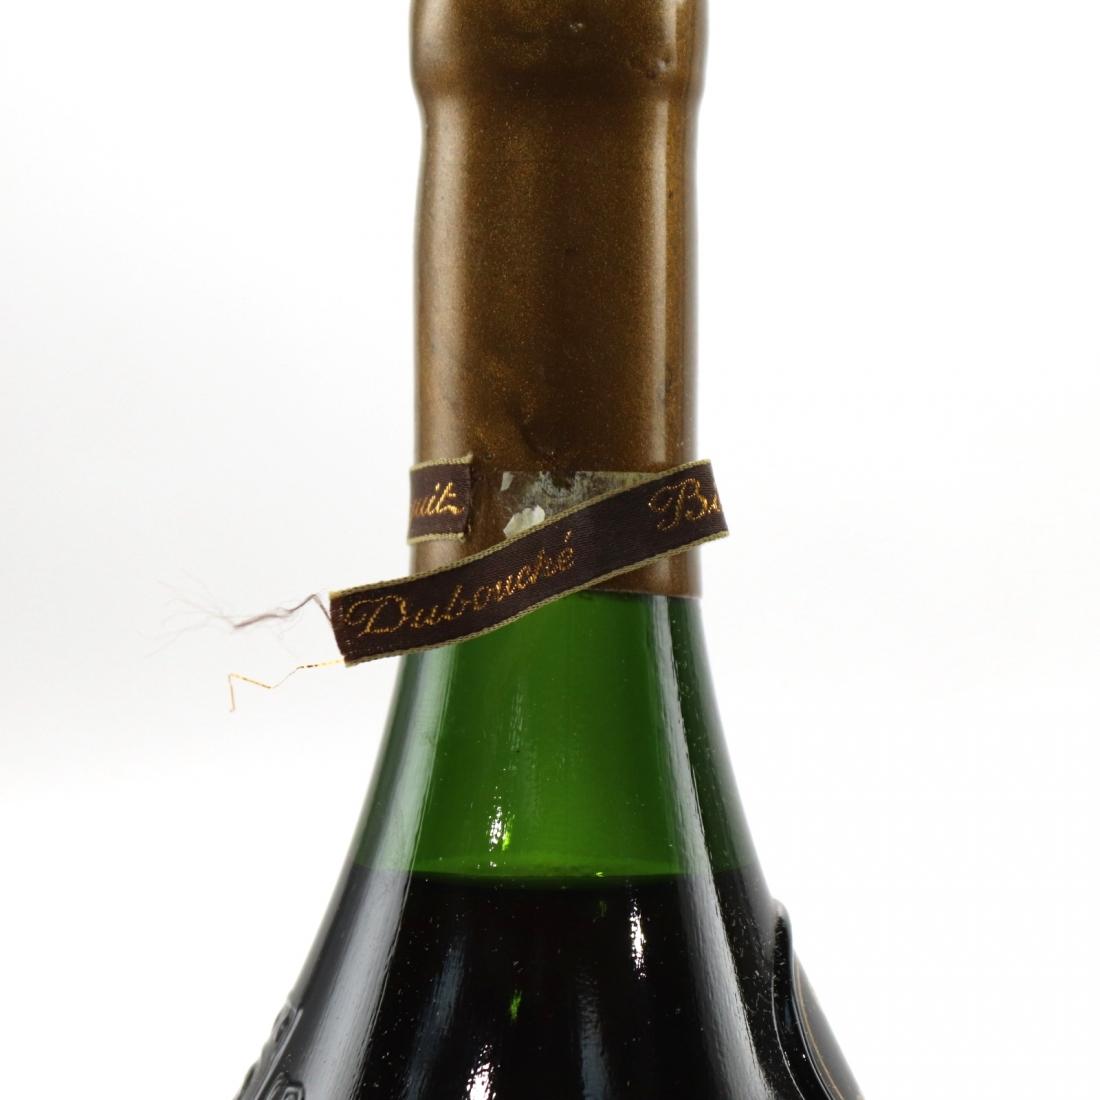 Bisquit Dubouche Grande Fine Champagne Cognac / German Import